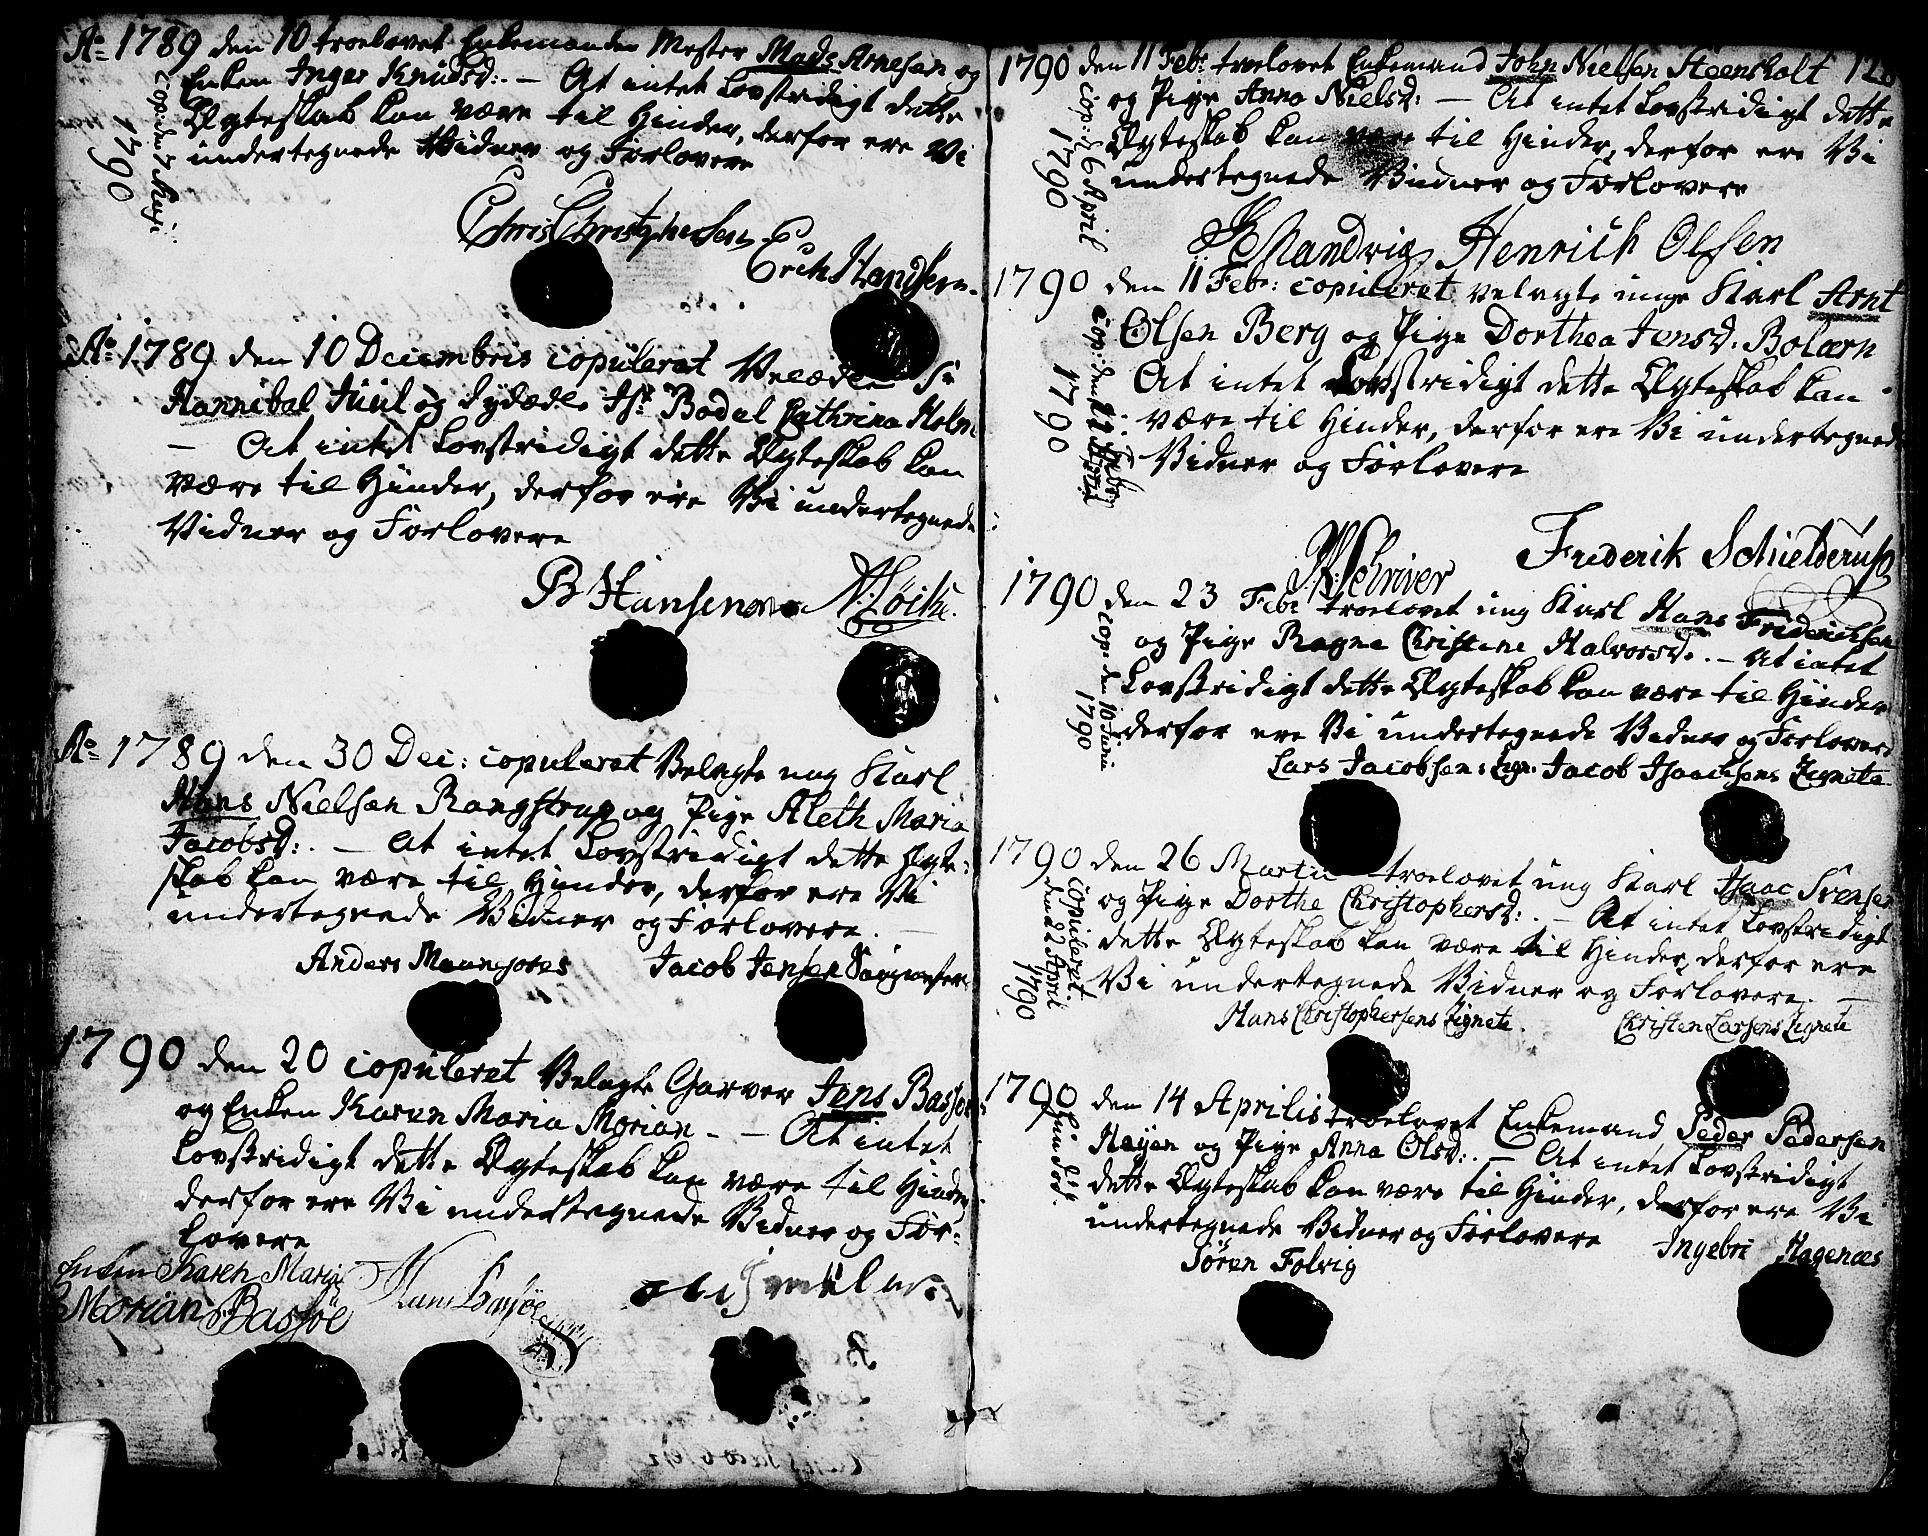 SAKO, Larvik kirkebøker, G/Ga/L0001: Klokkerbok nr. I 1, 1785-1807, s. 128